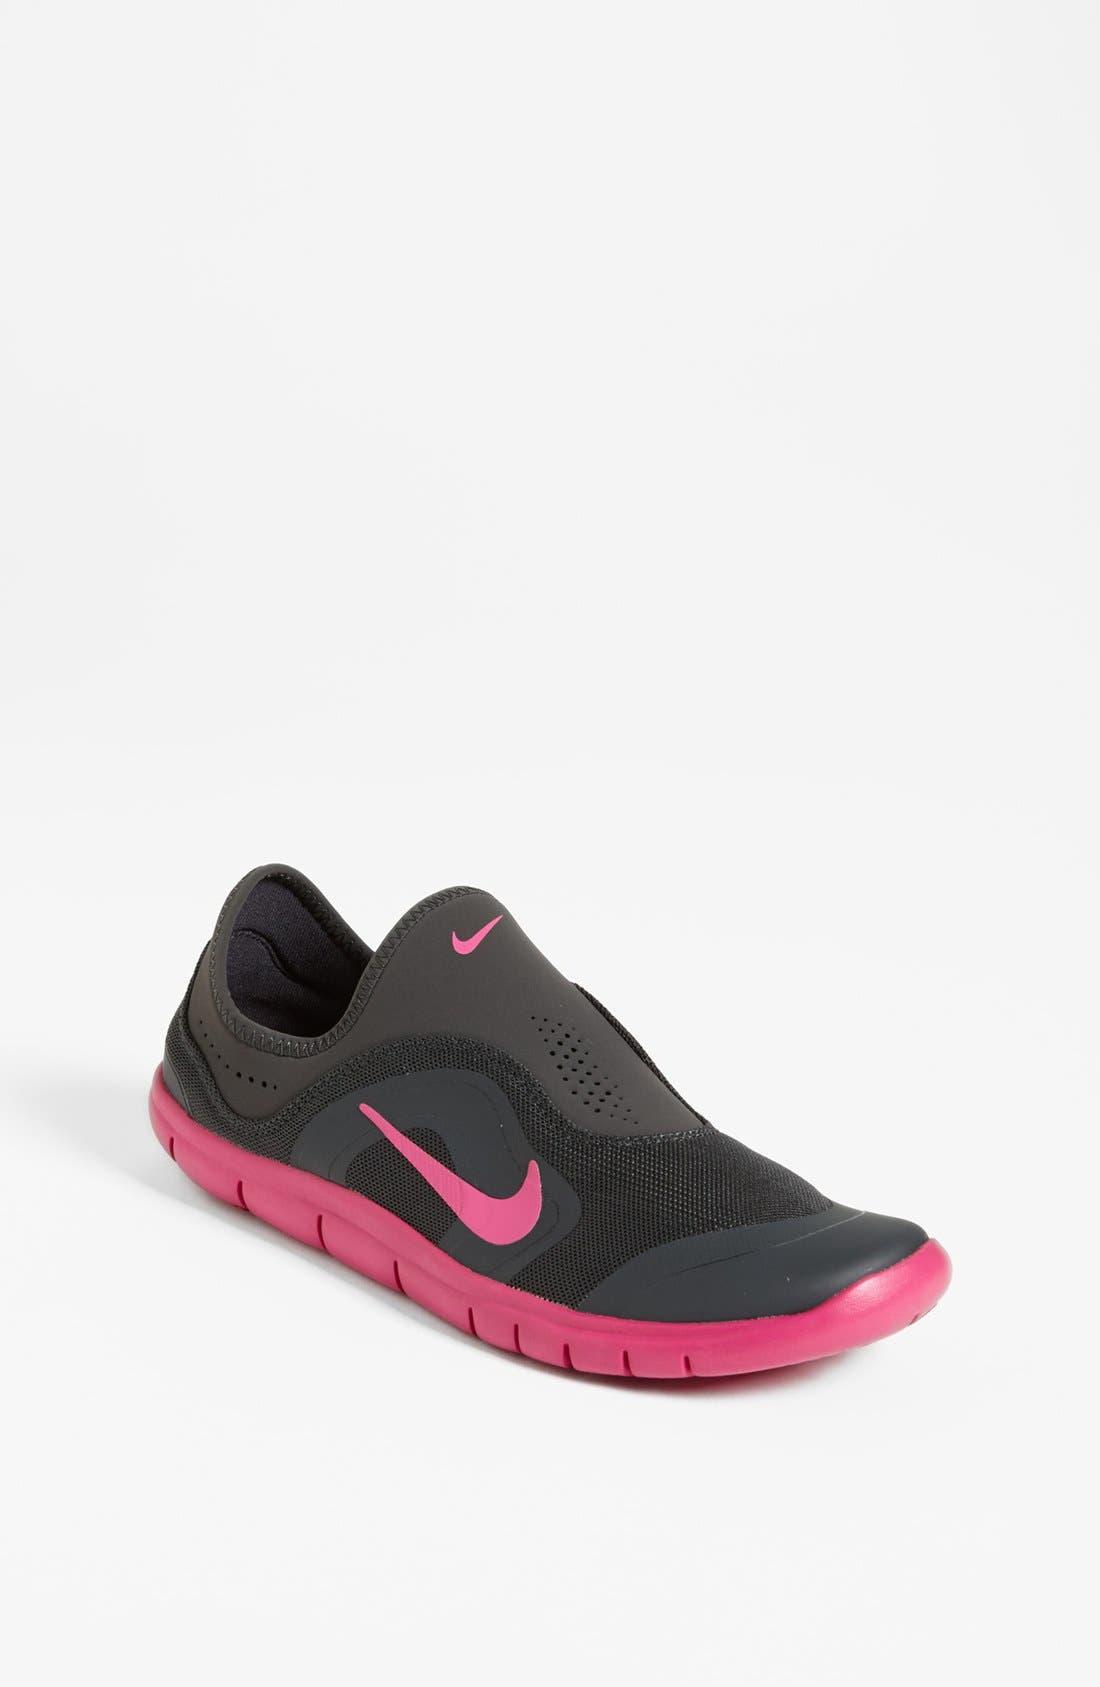 Alternate Image 1 Selected - Nike 'Flex Protect' Sneaker (Baby, Walker, Toddler, Little Kid & Big Kid)